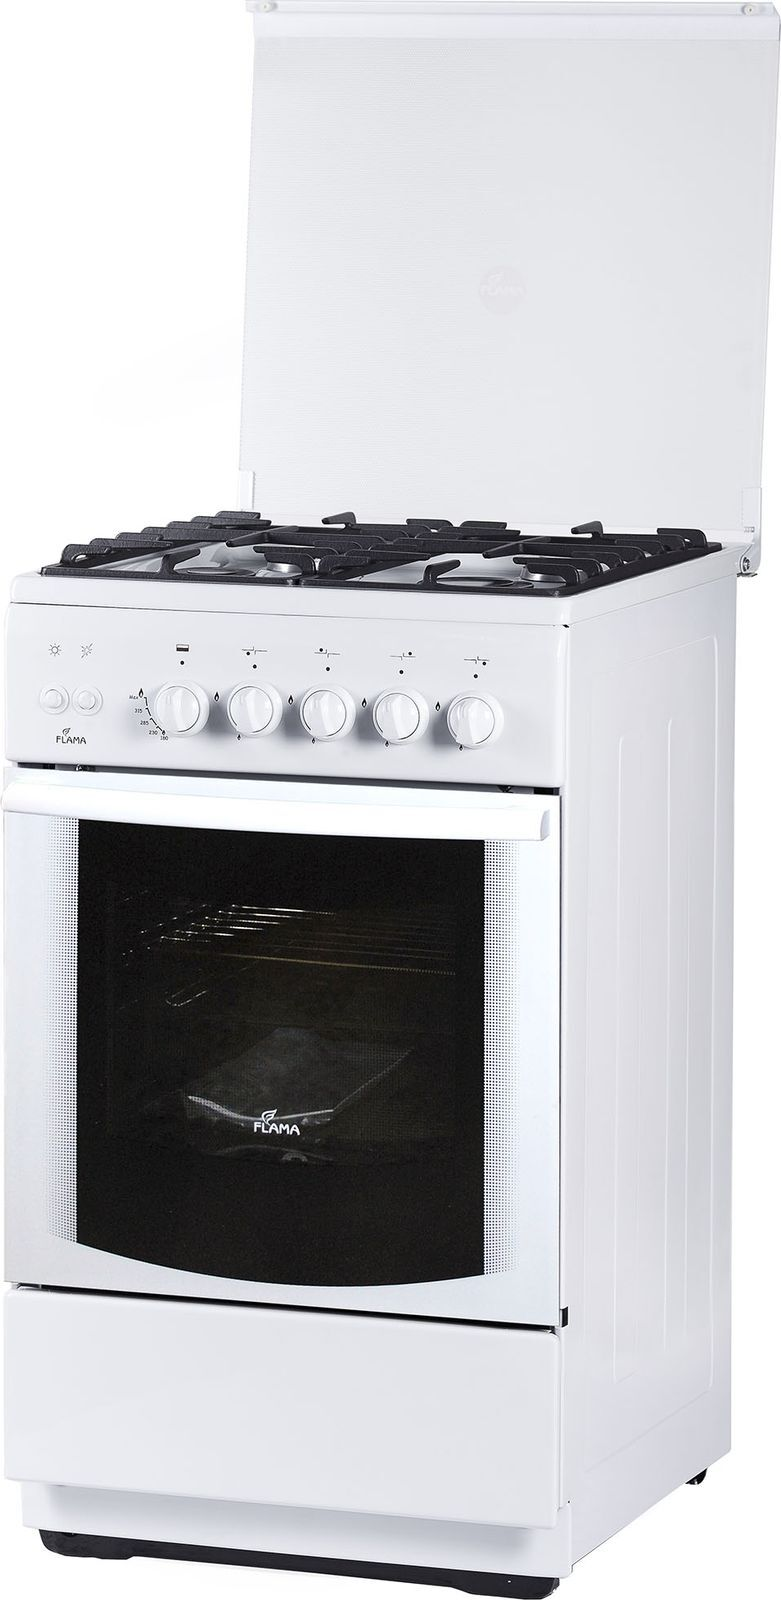 Кухонная плита Flama FG 24228 W, белый